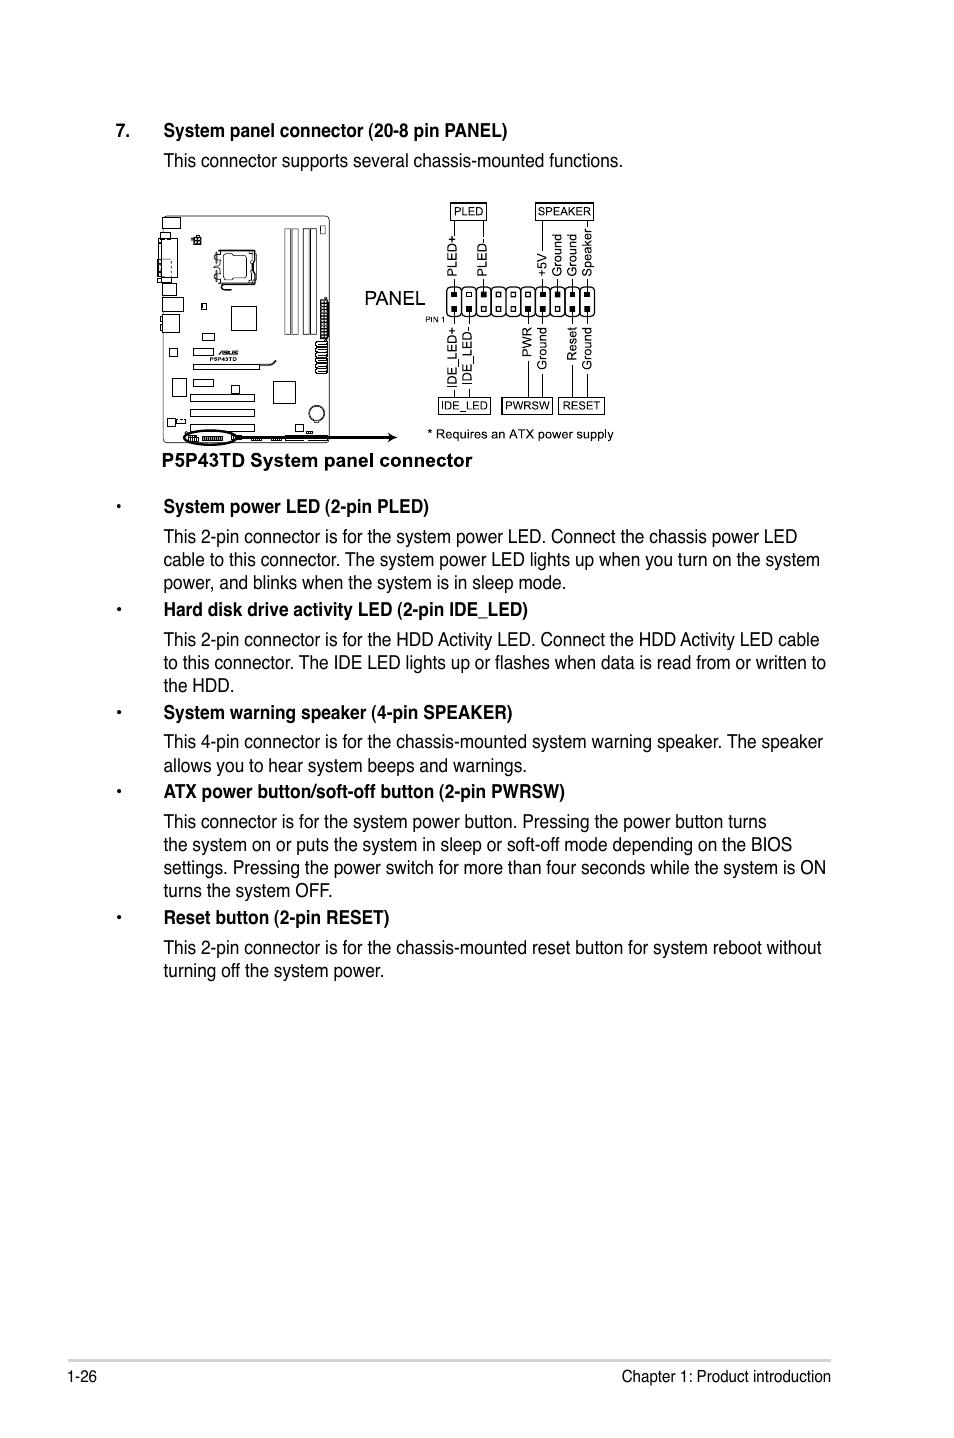 Asus P5P43TD/USB3 User Manual | Page 36 / 62 | Original mode | Also